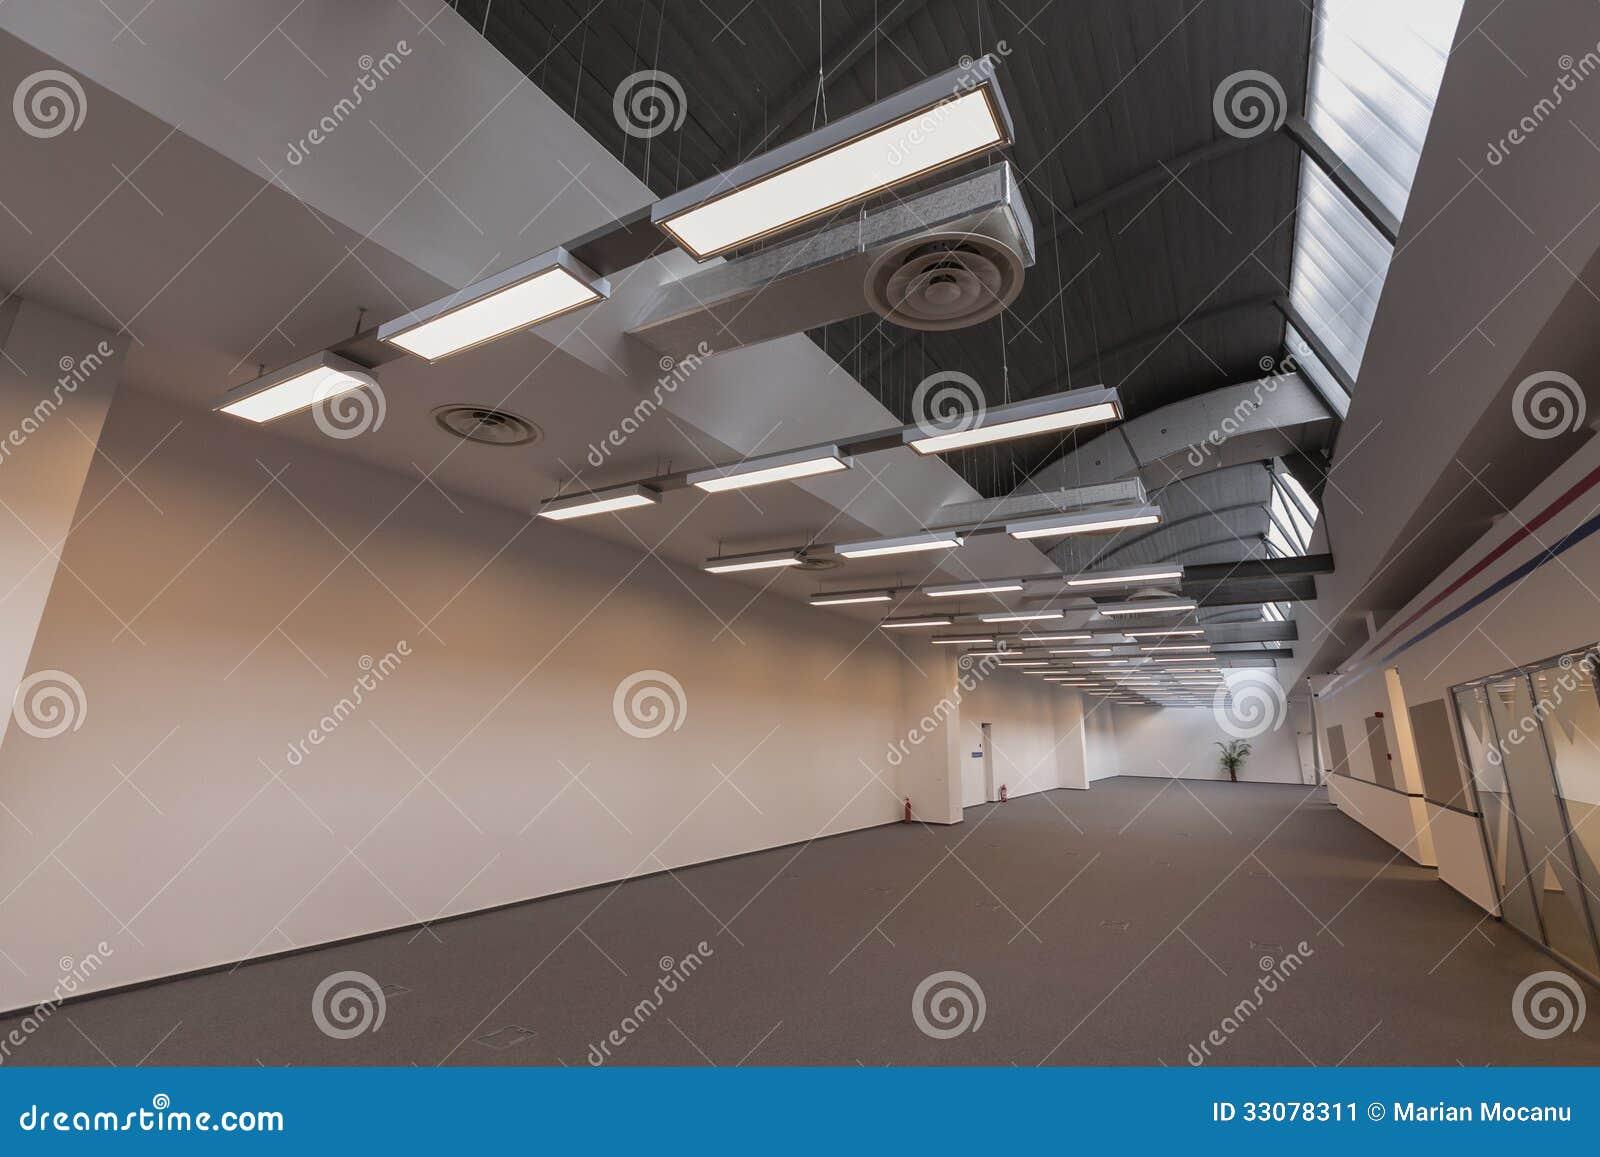 Storage Hall - Empty Stock Image - Image: 33078311